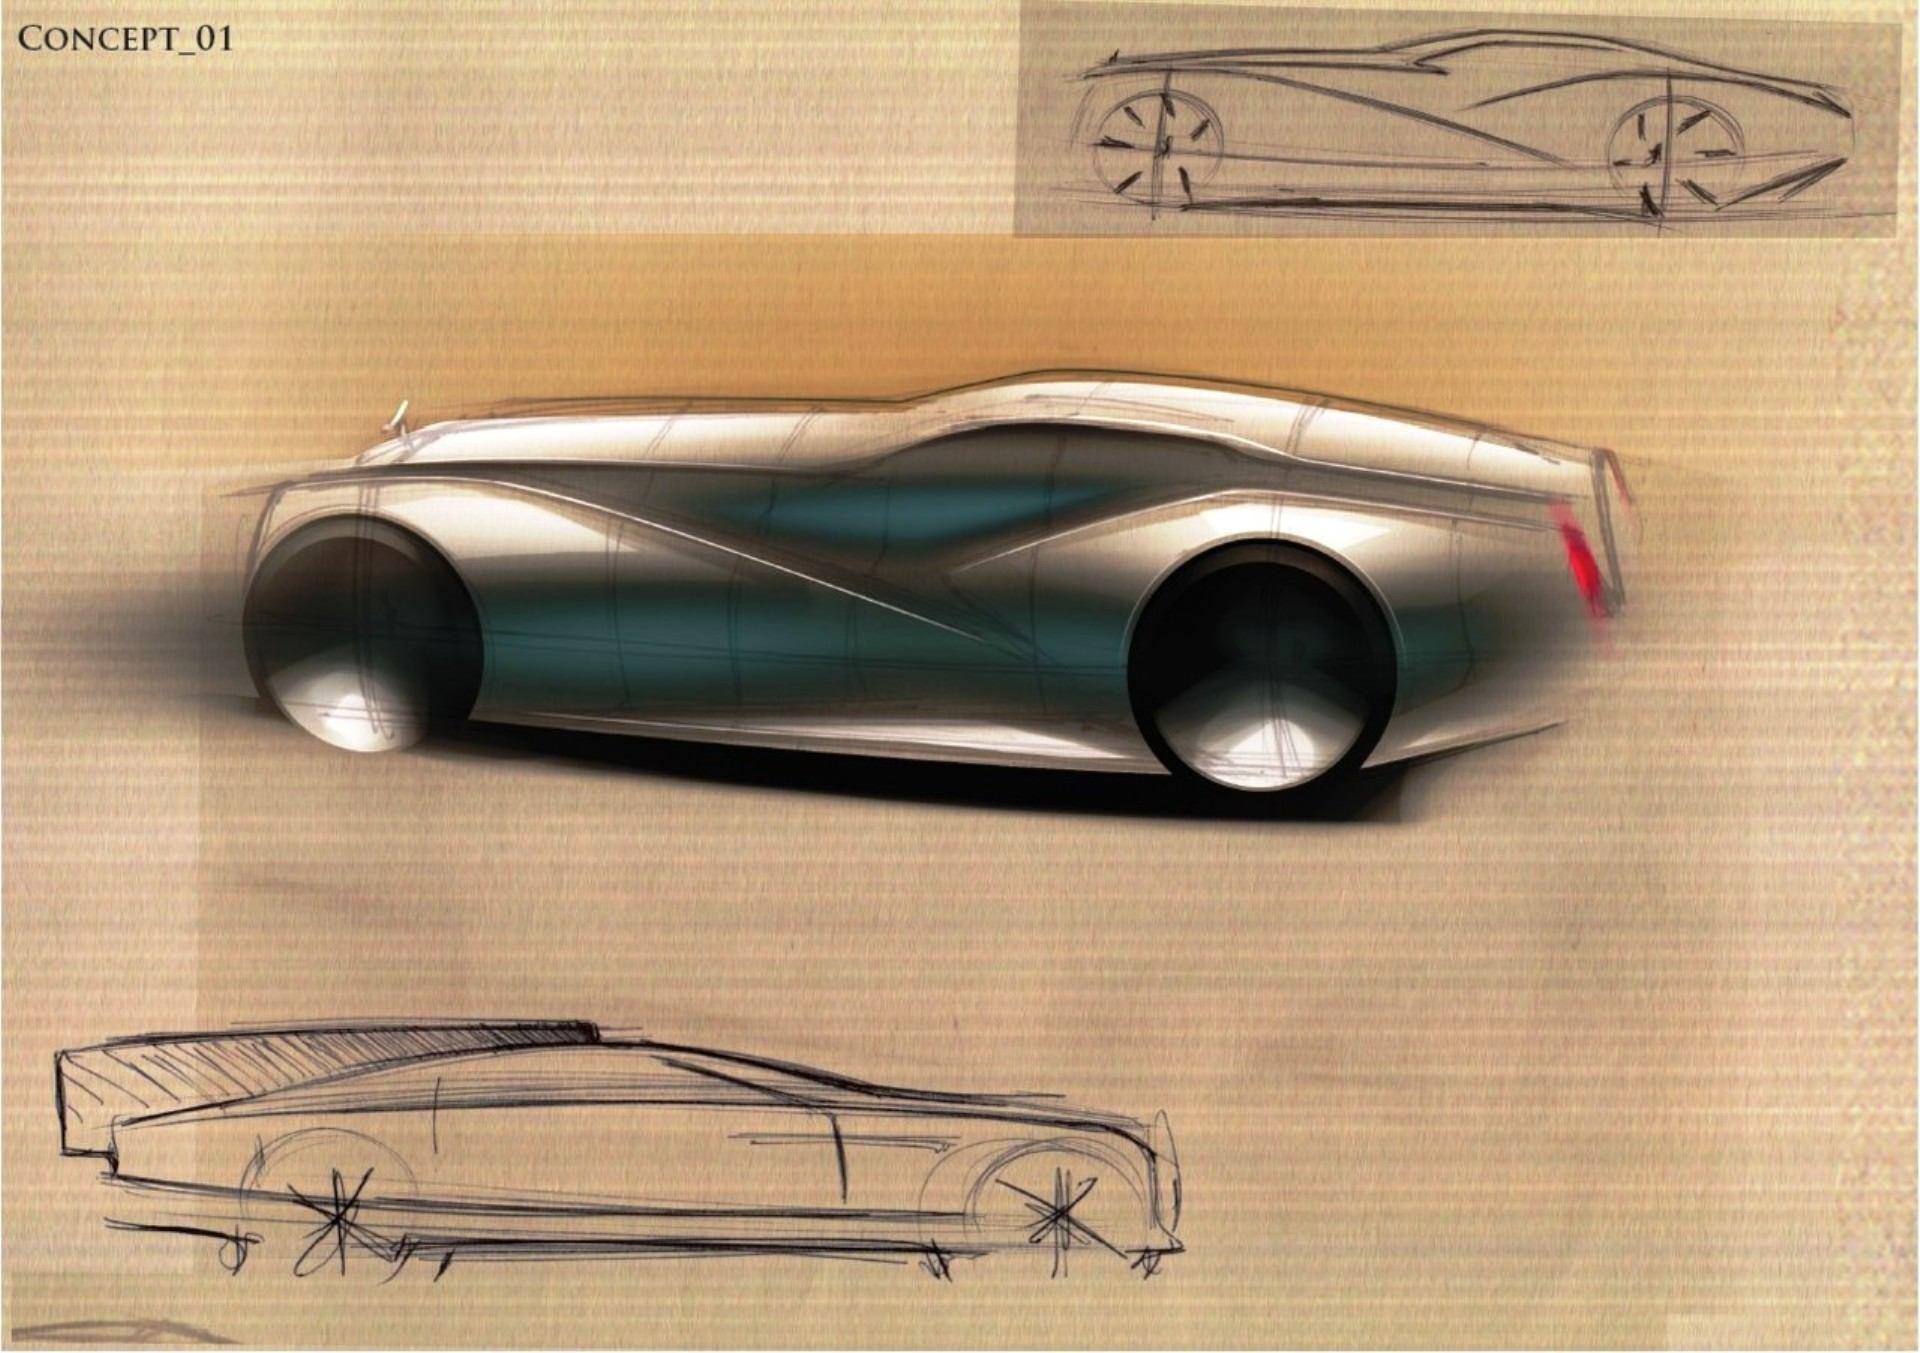 Design car contest -  Design Talent Showcase Jan Rosenthal S 2023 Rolls Royce Concept Wins Official Rca Contest 14